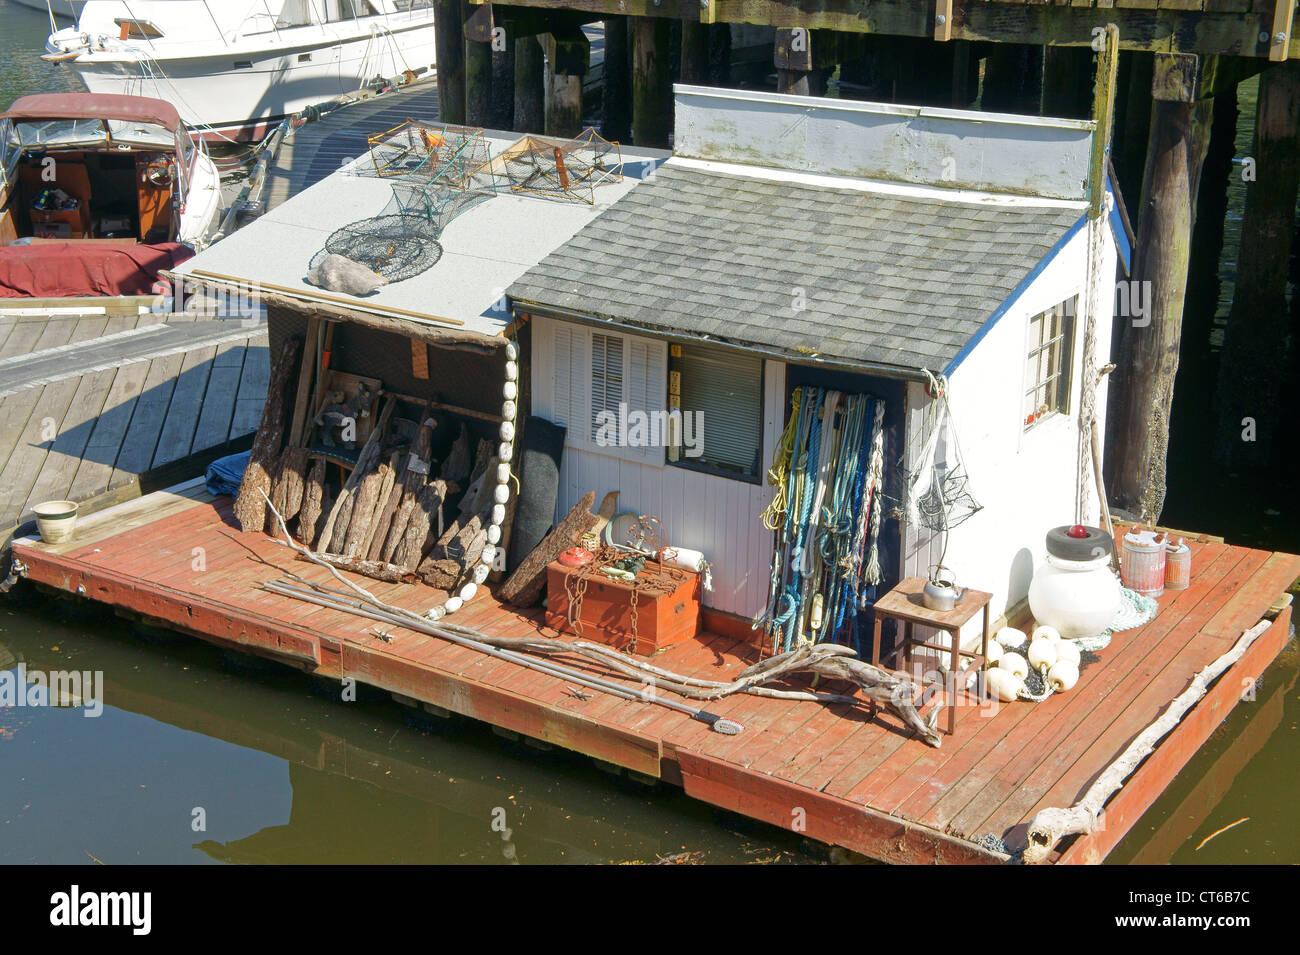 small-floating-house-in-snug-cove-bowen-island-british-columbia-CT6B7C.jpg